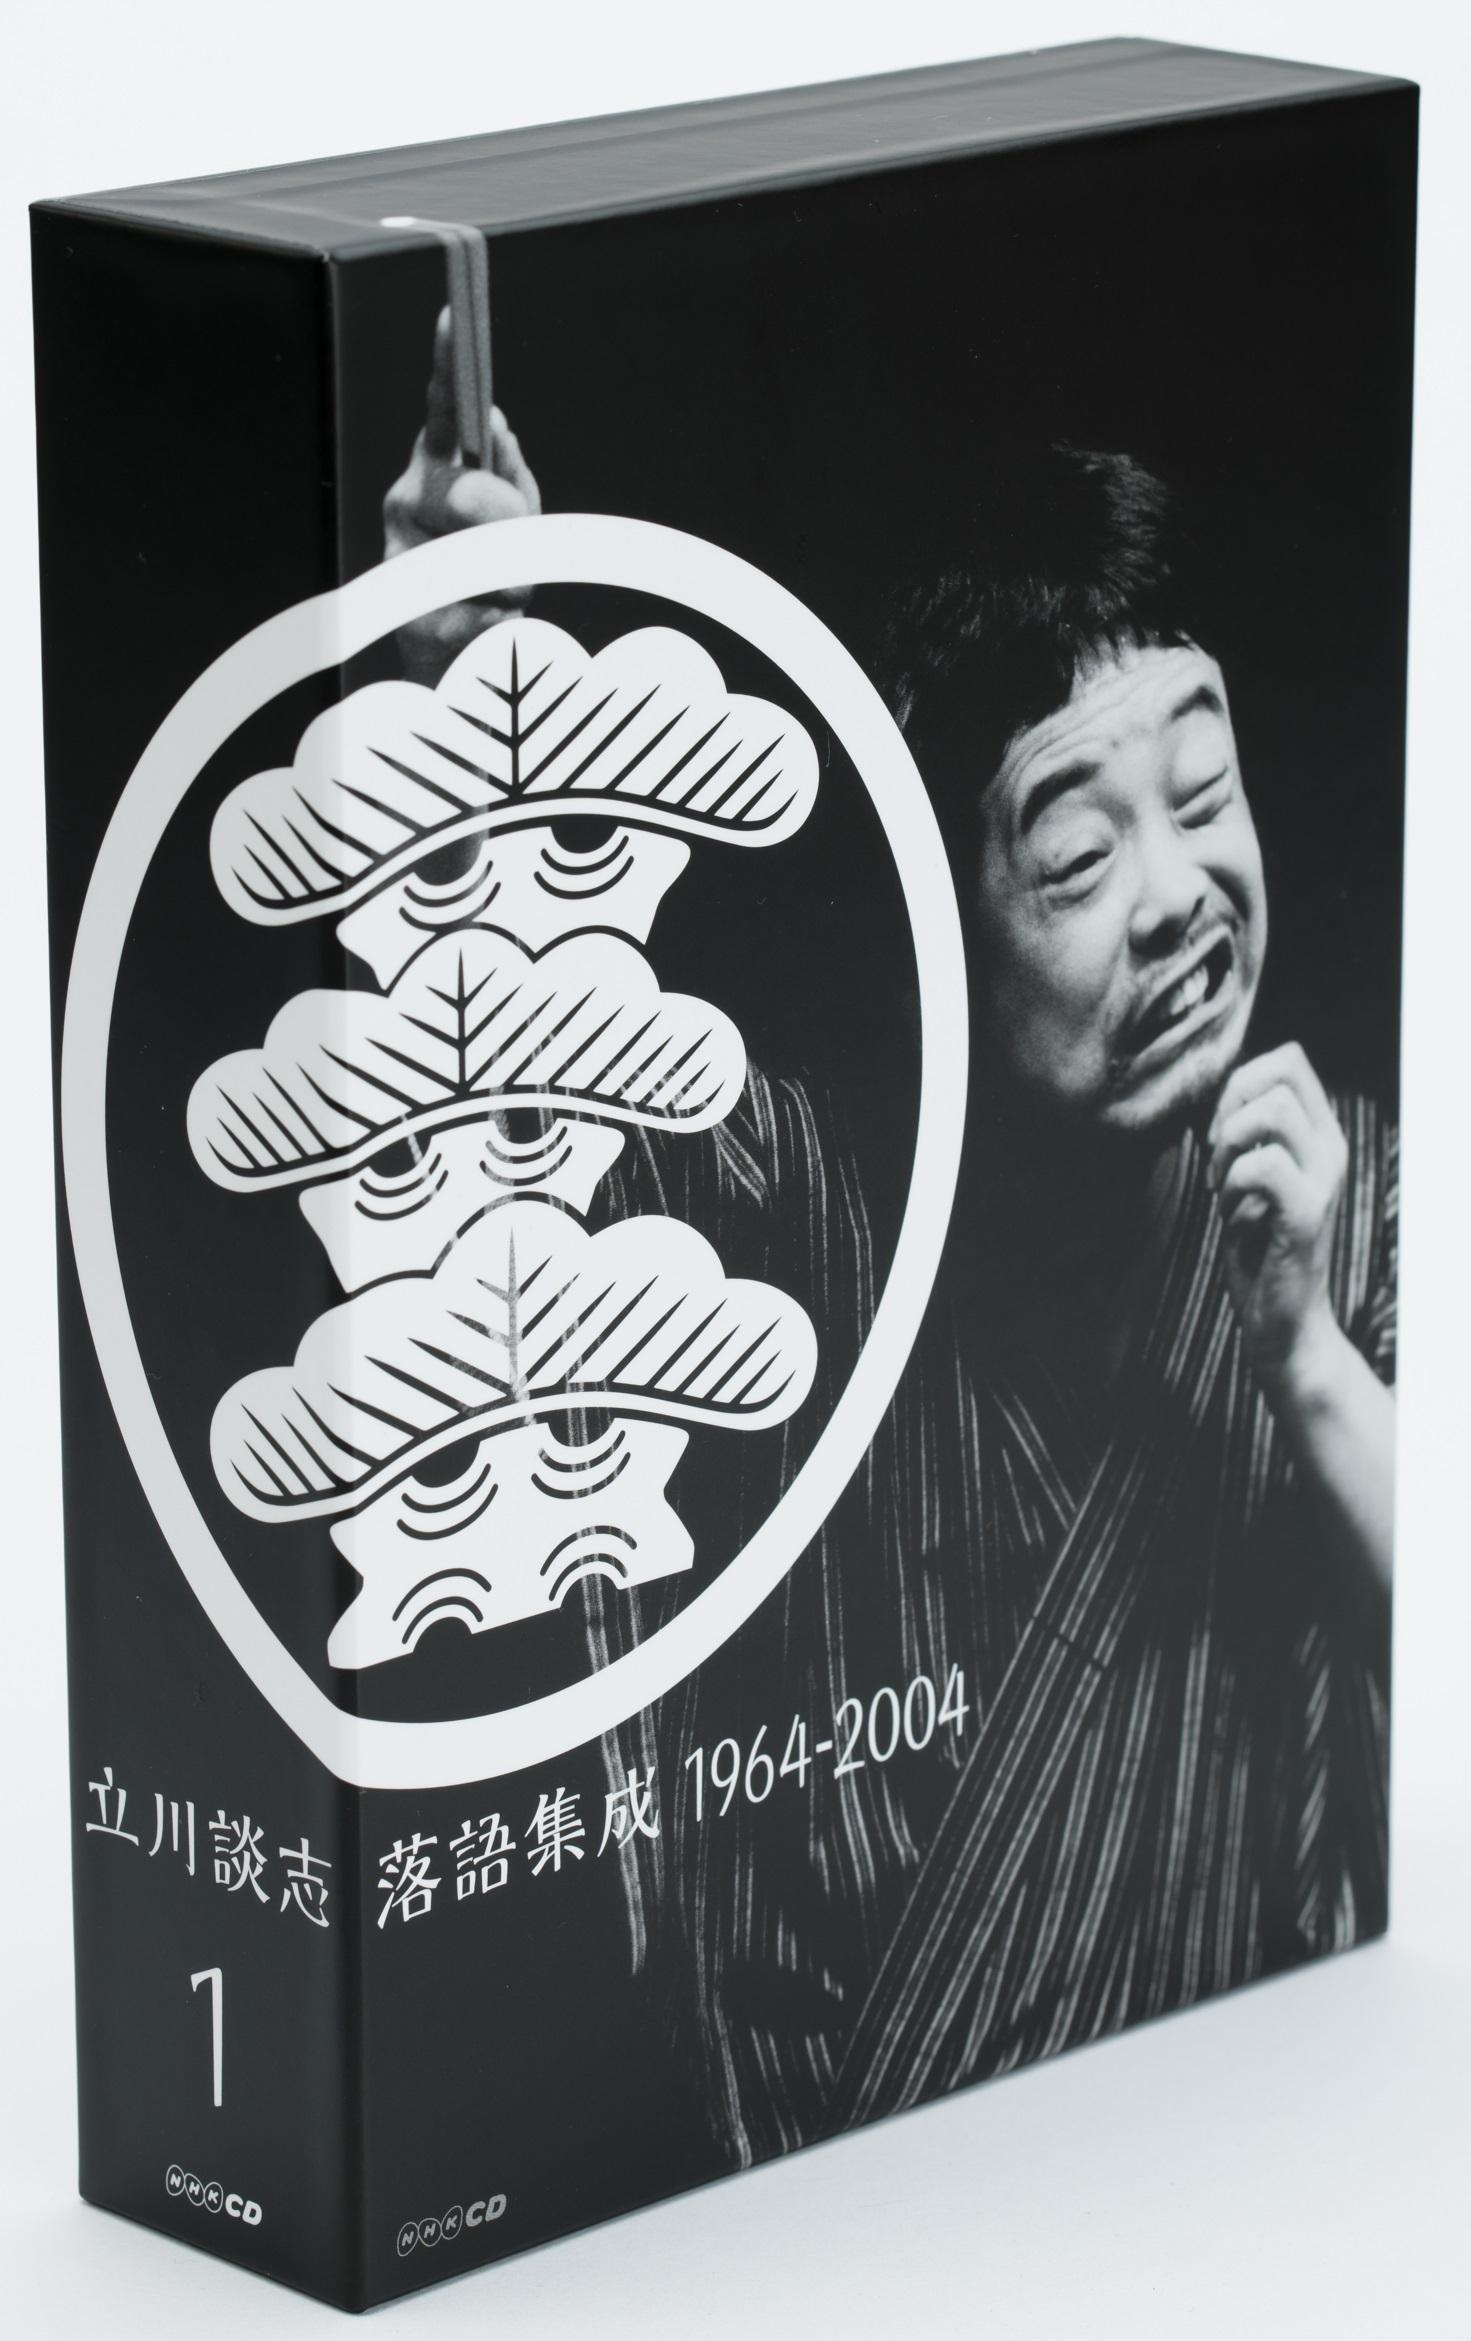 NHKCD「立川談志 落語集成 1964-2004」第1集(全3集)~各5枚組CD+ブックレット